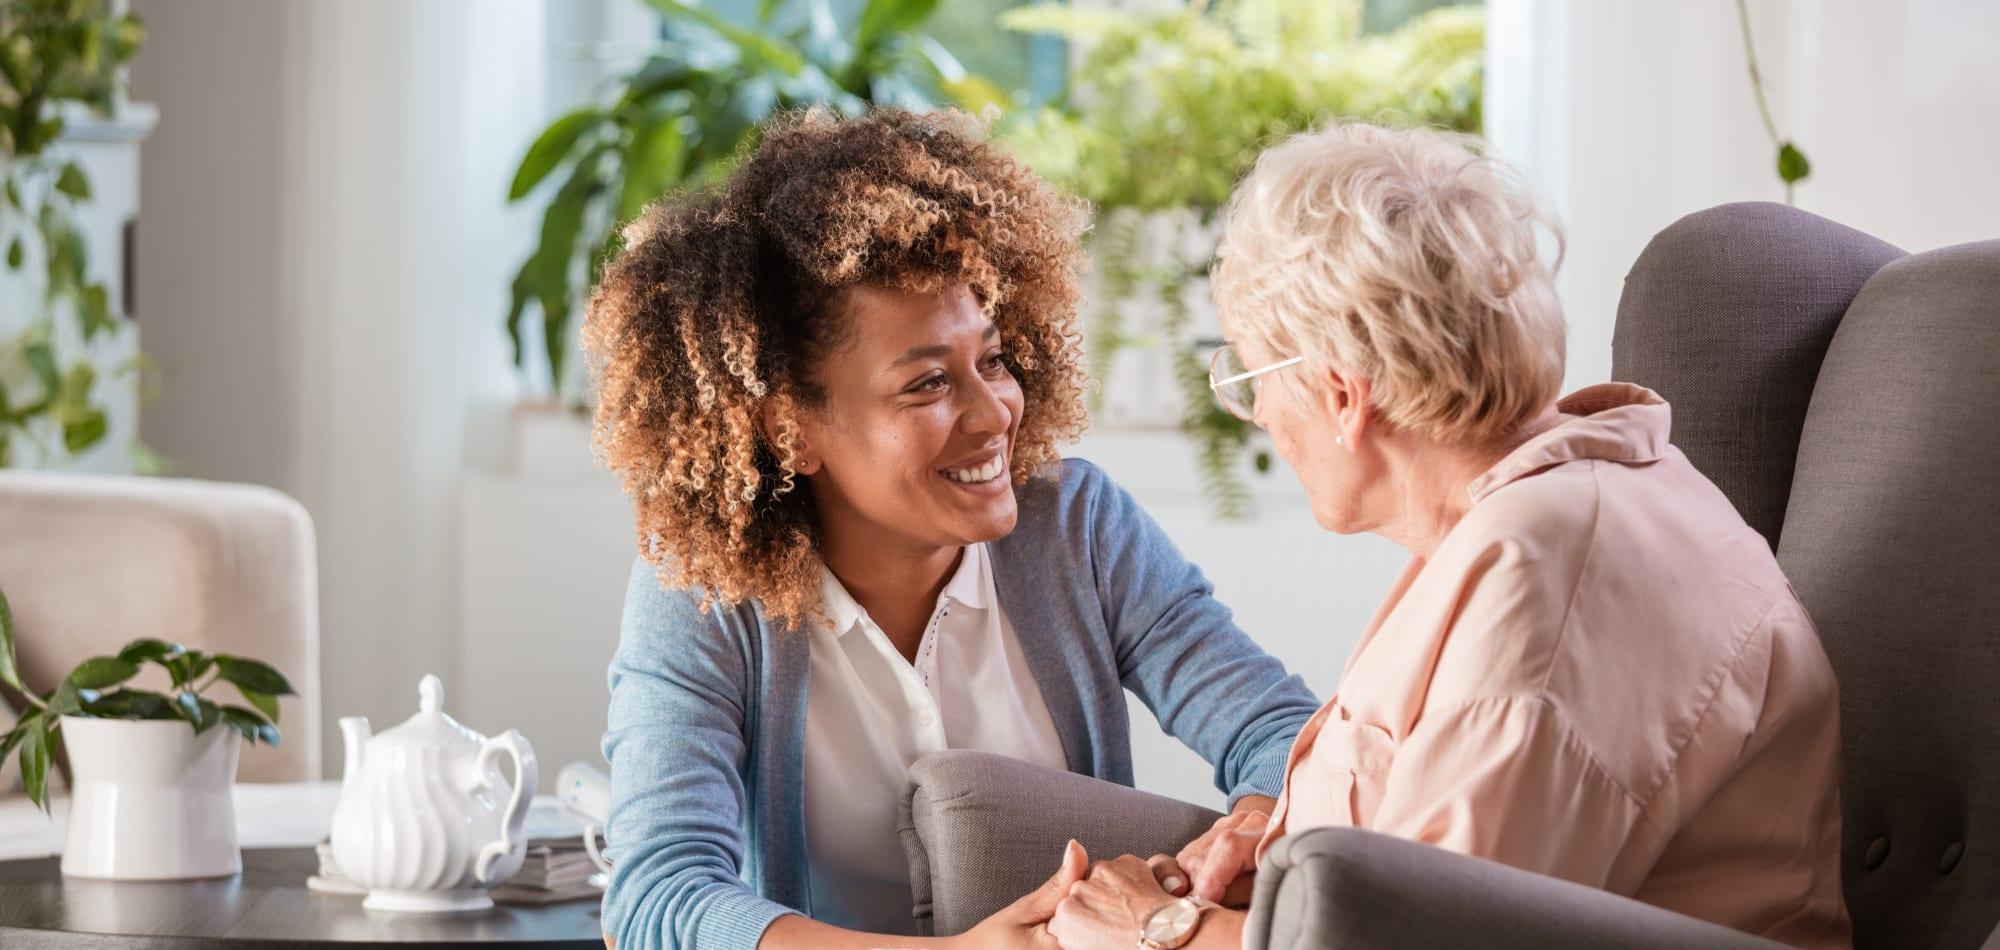 Careers at Milestone Senior Living in Cross Plains, Wisconsin.